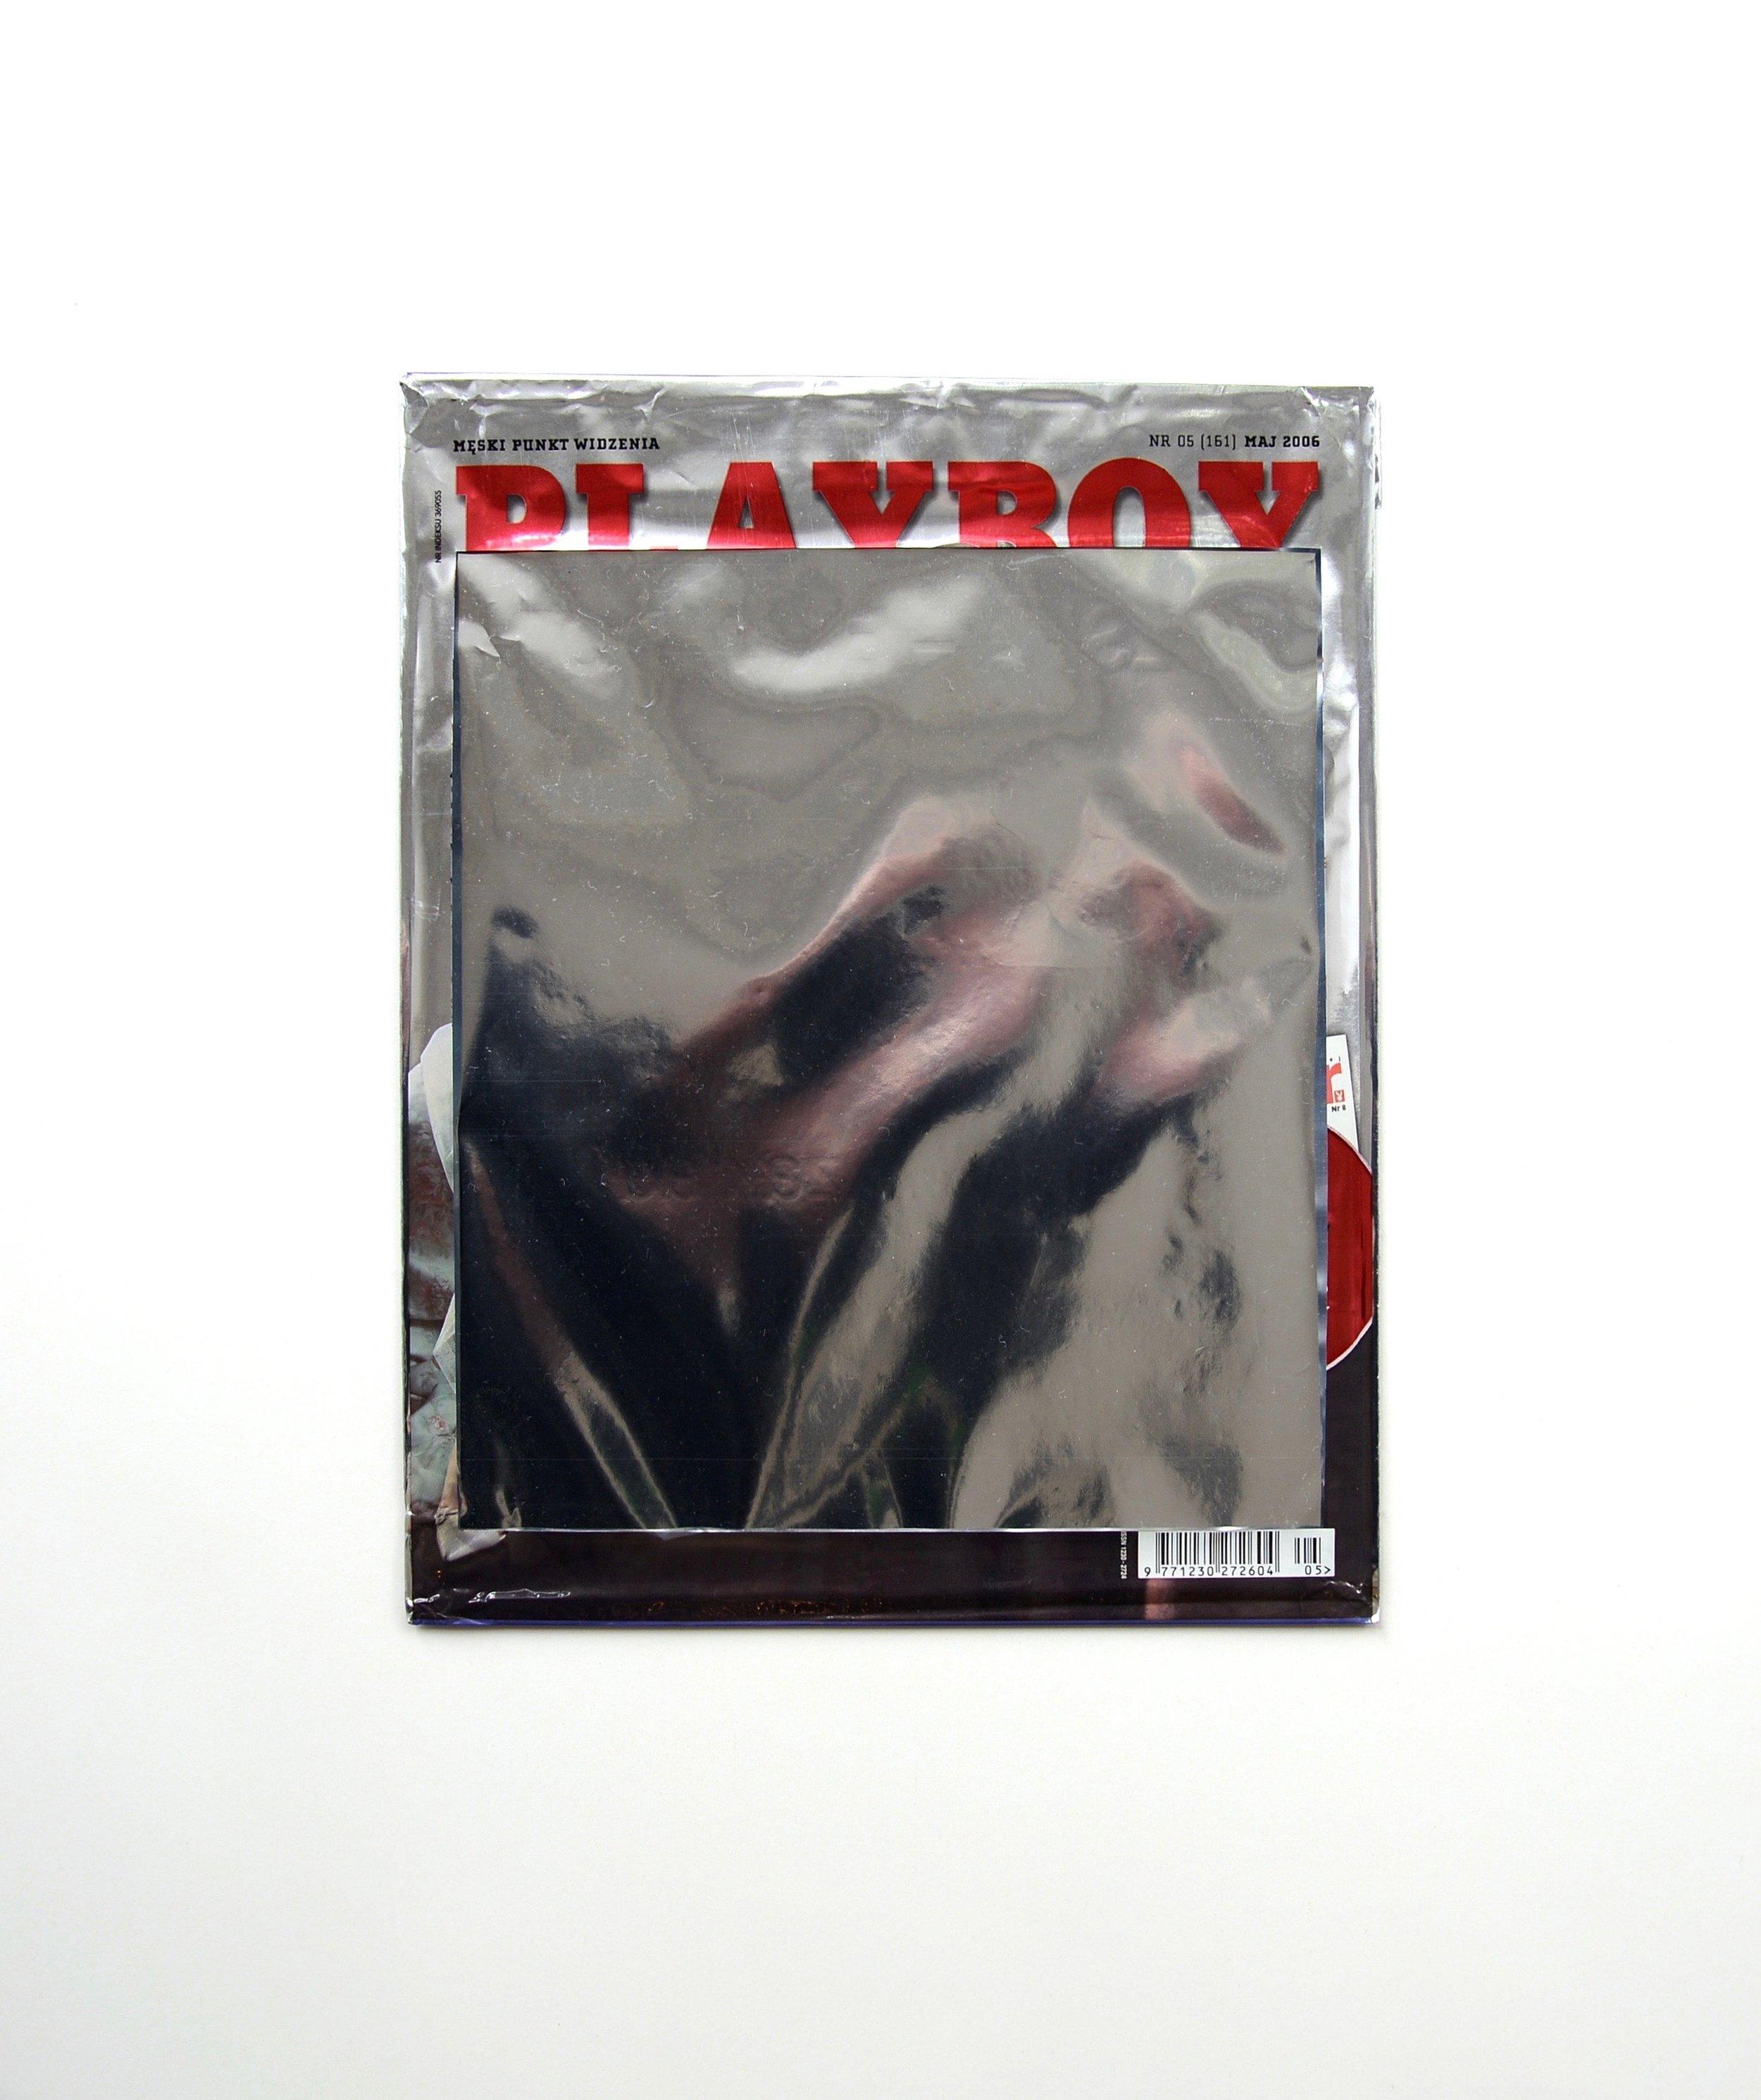 Roland Schefferski, Playboy May, 2006